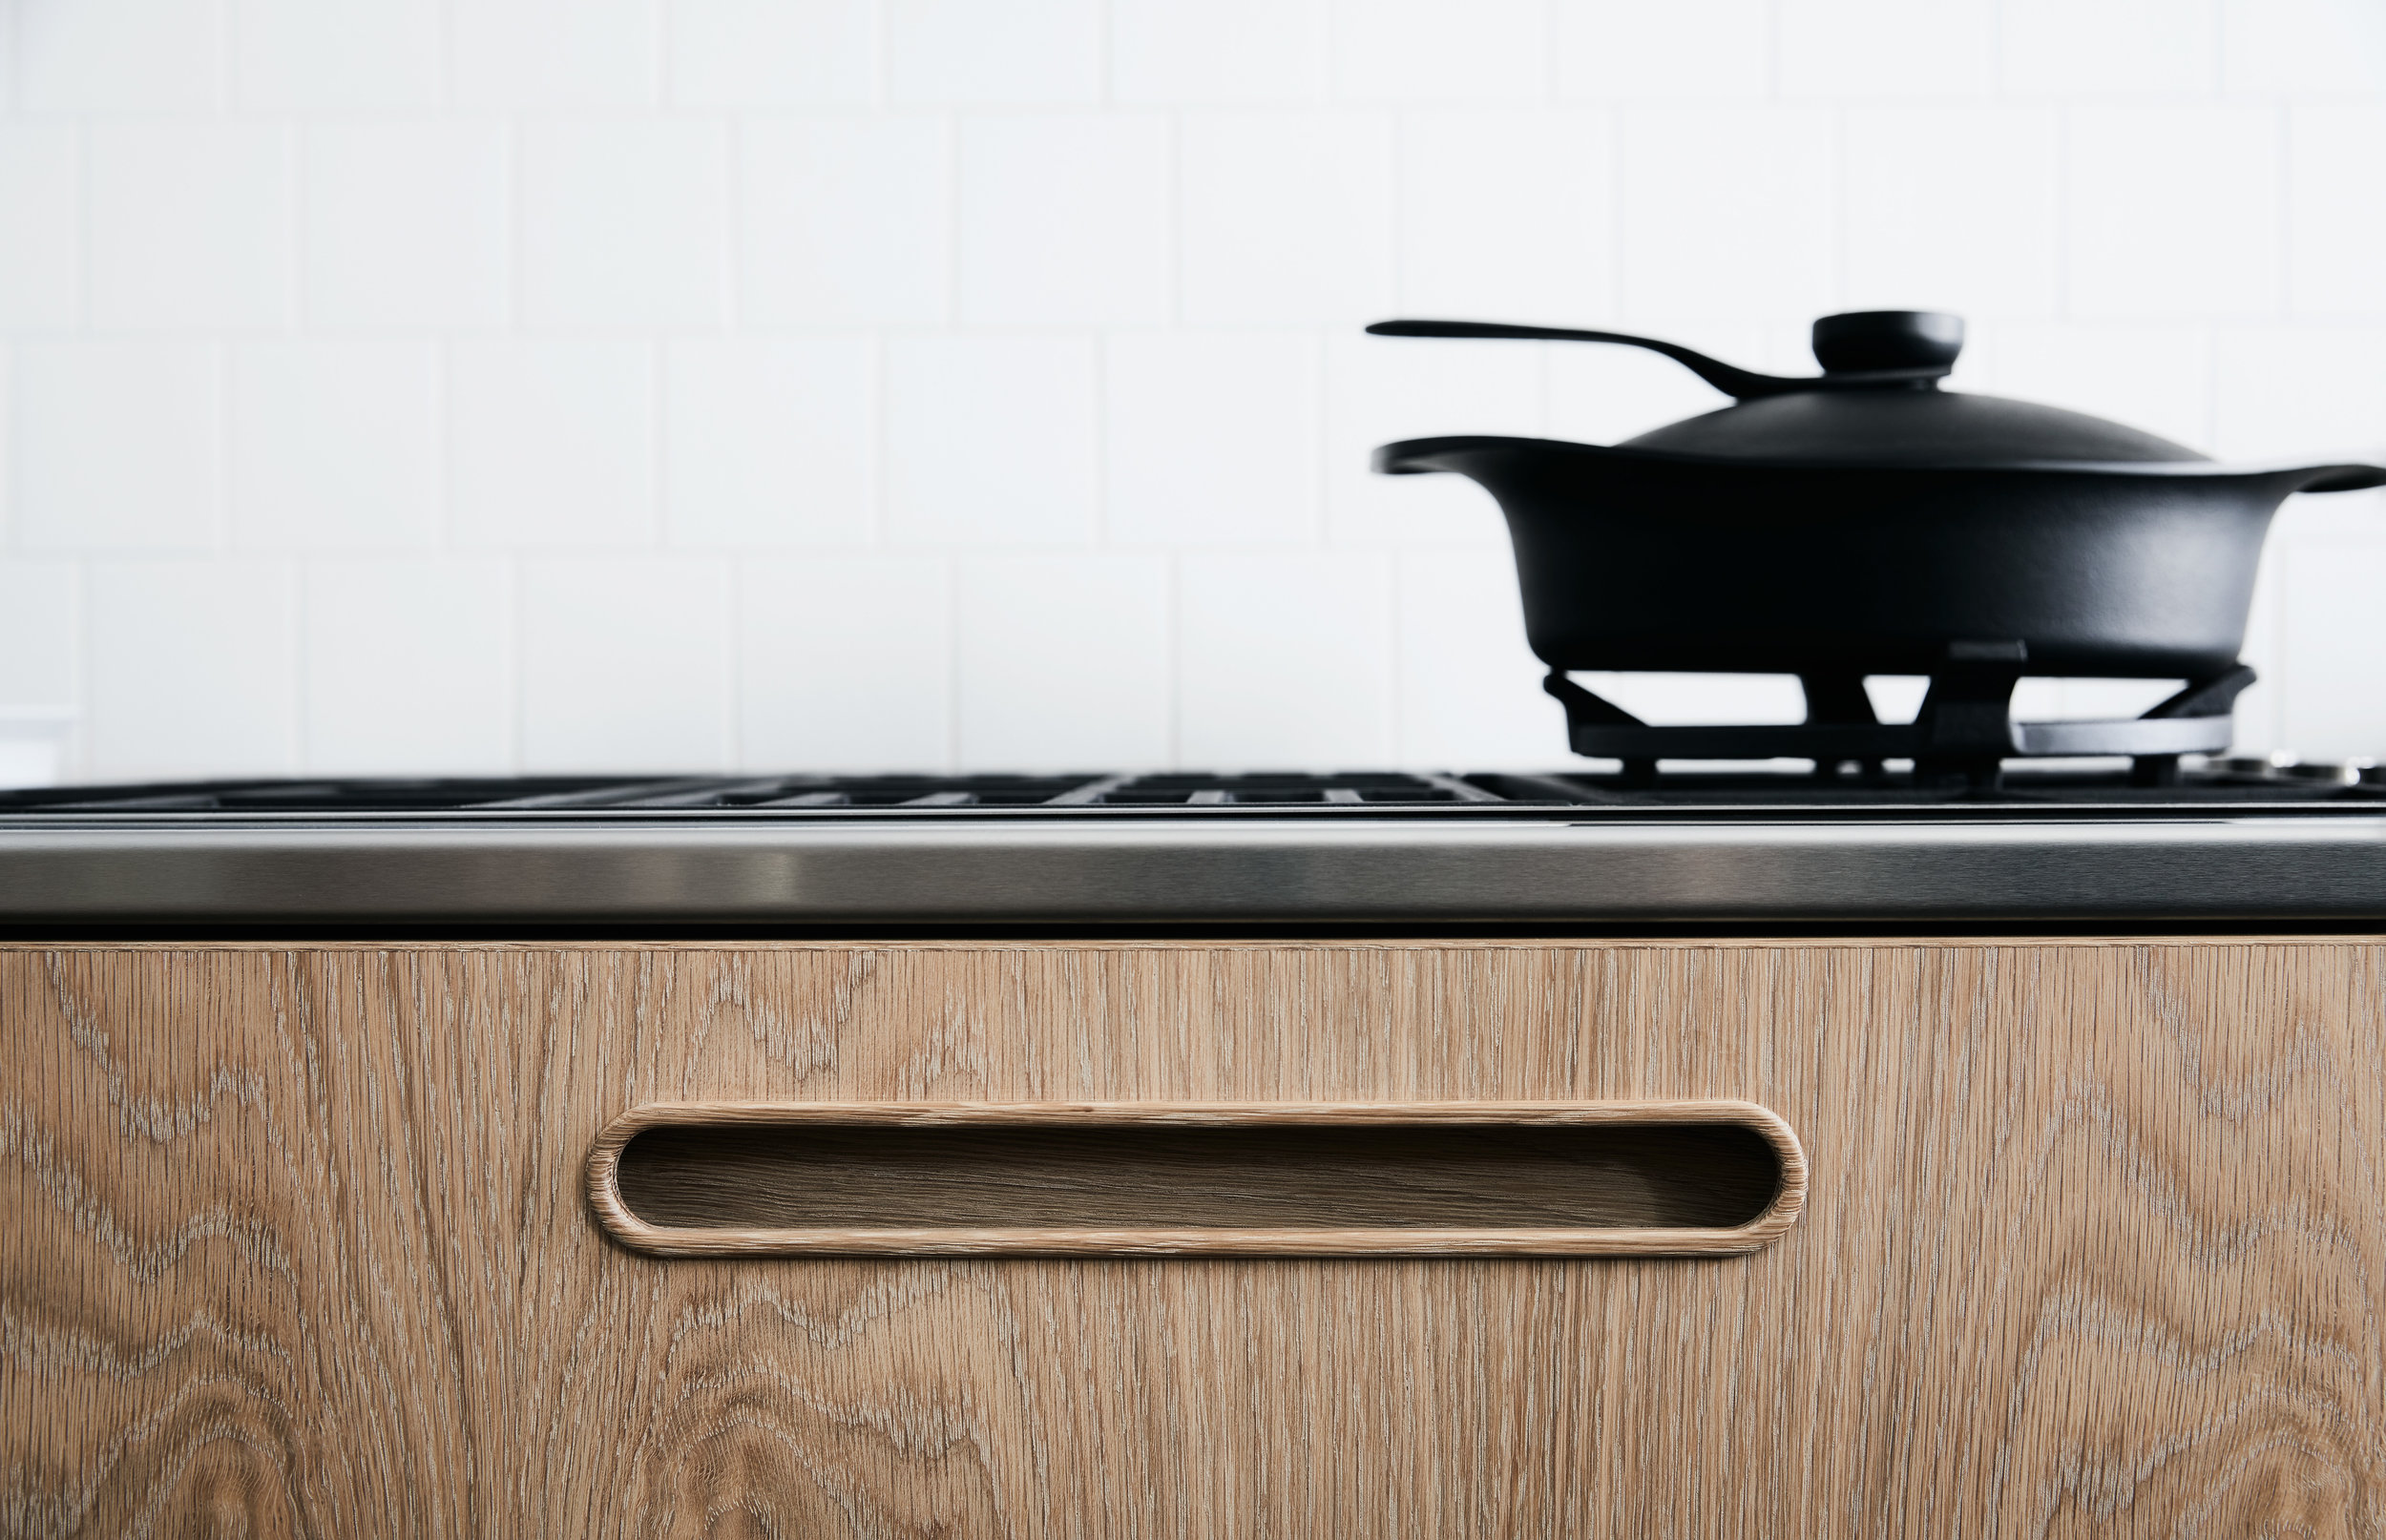 Tableau Cantilever DesignOffice Kitchen System Australia (6).jpg